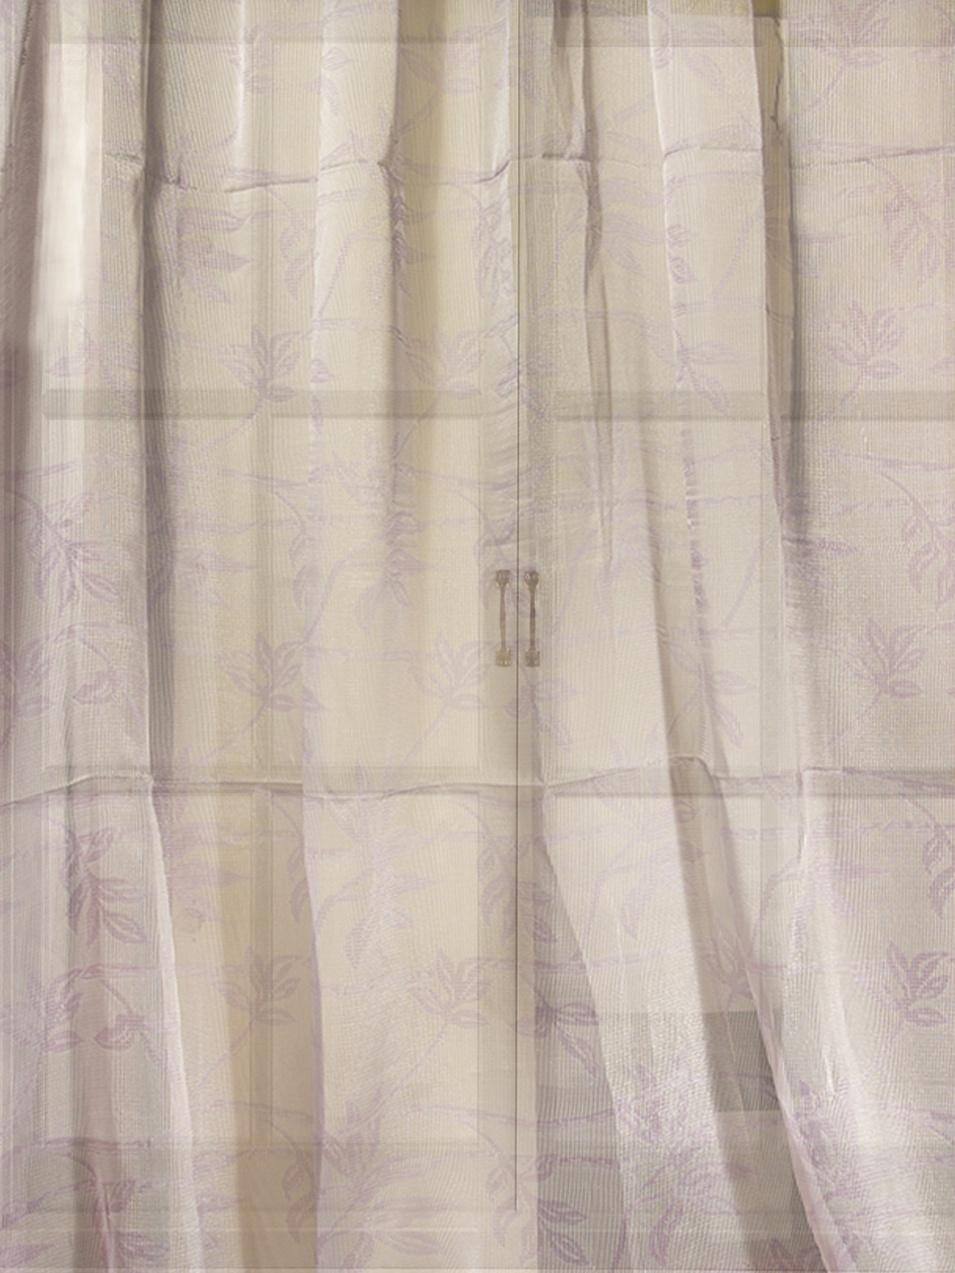 Шторы комнатные Айлант ОБ20 шторы homedeco нитяные шторы яркие кольца